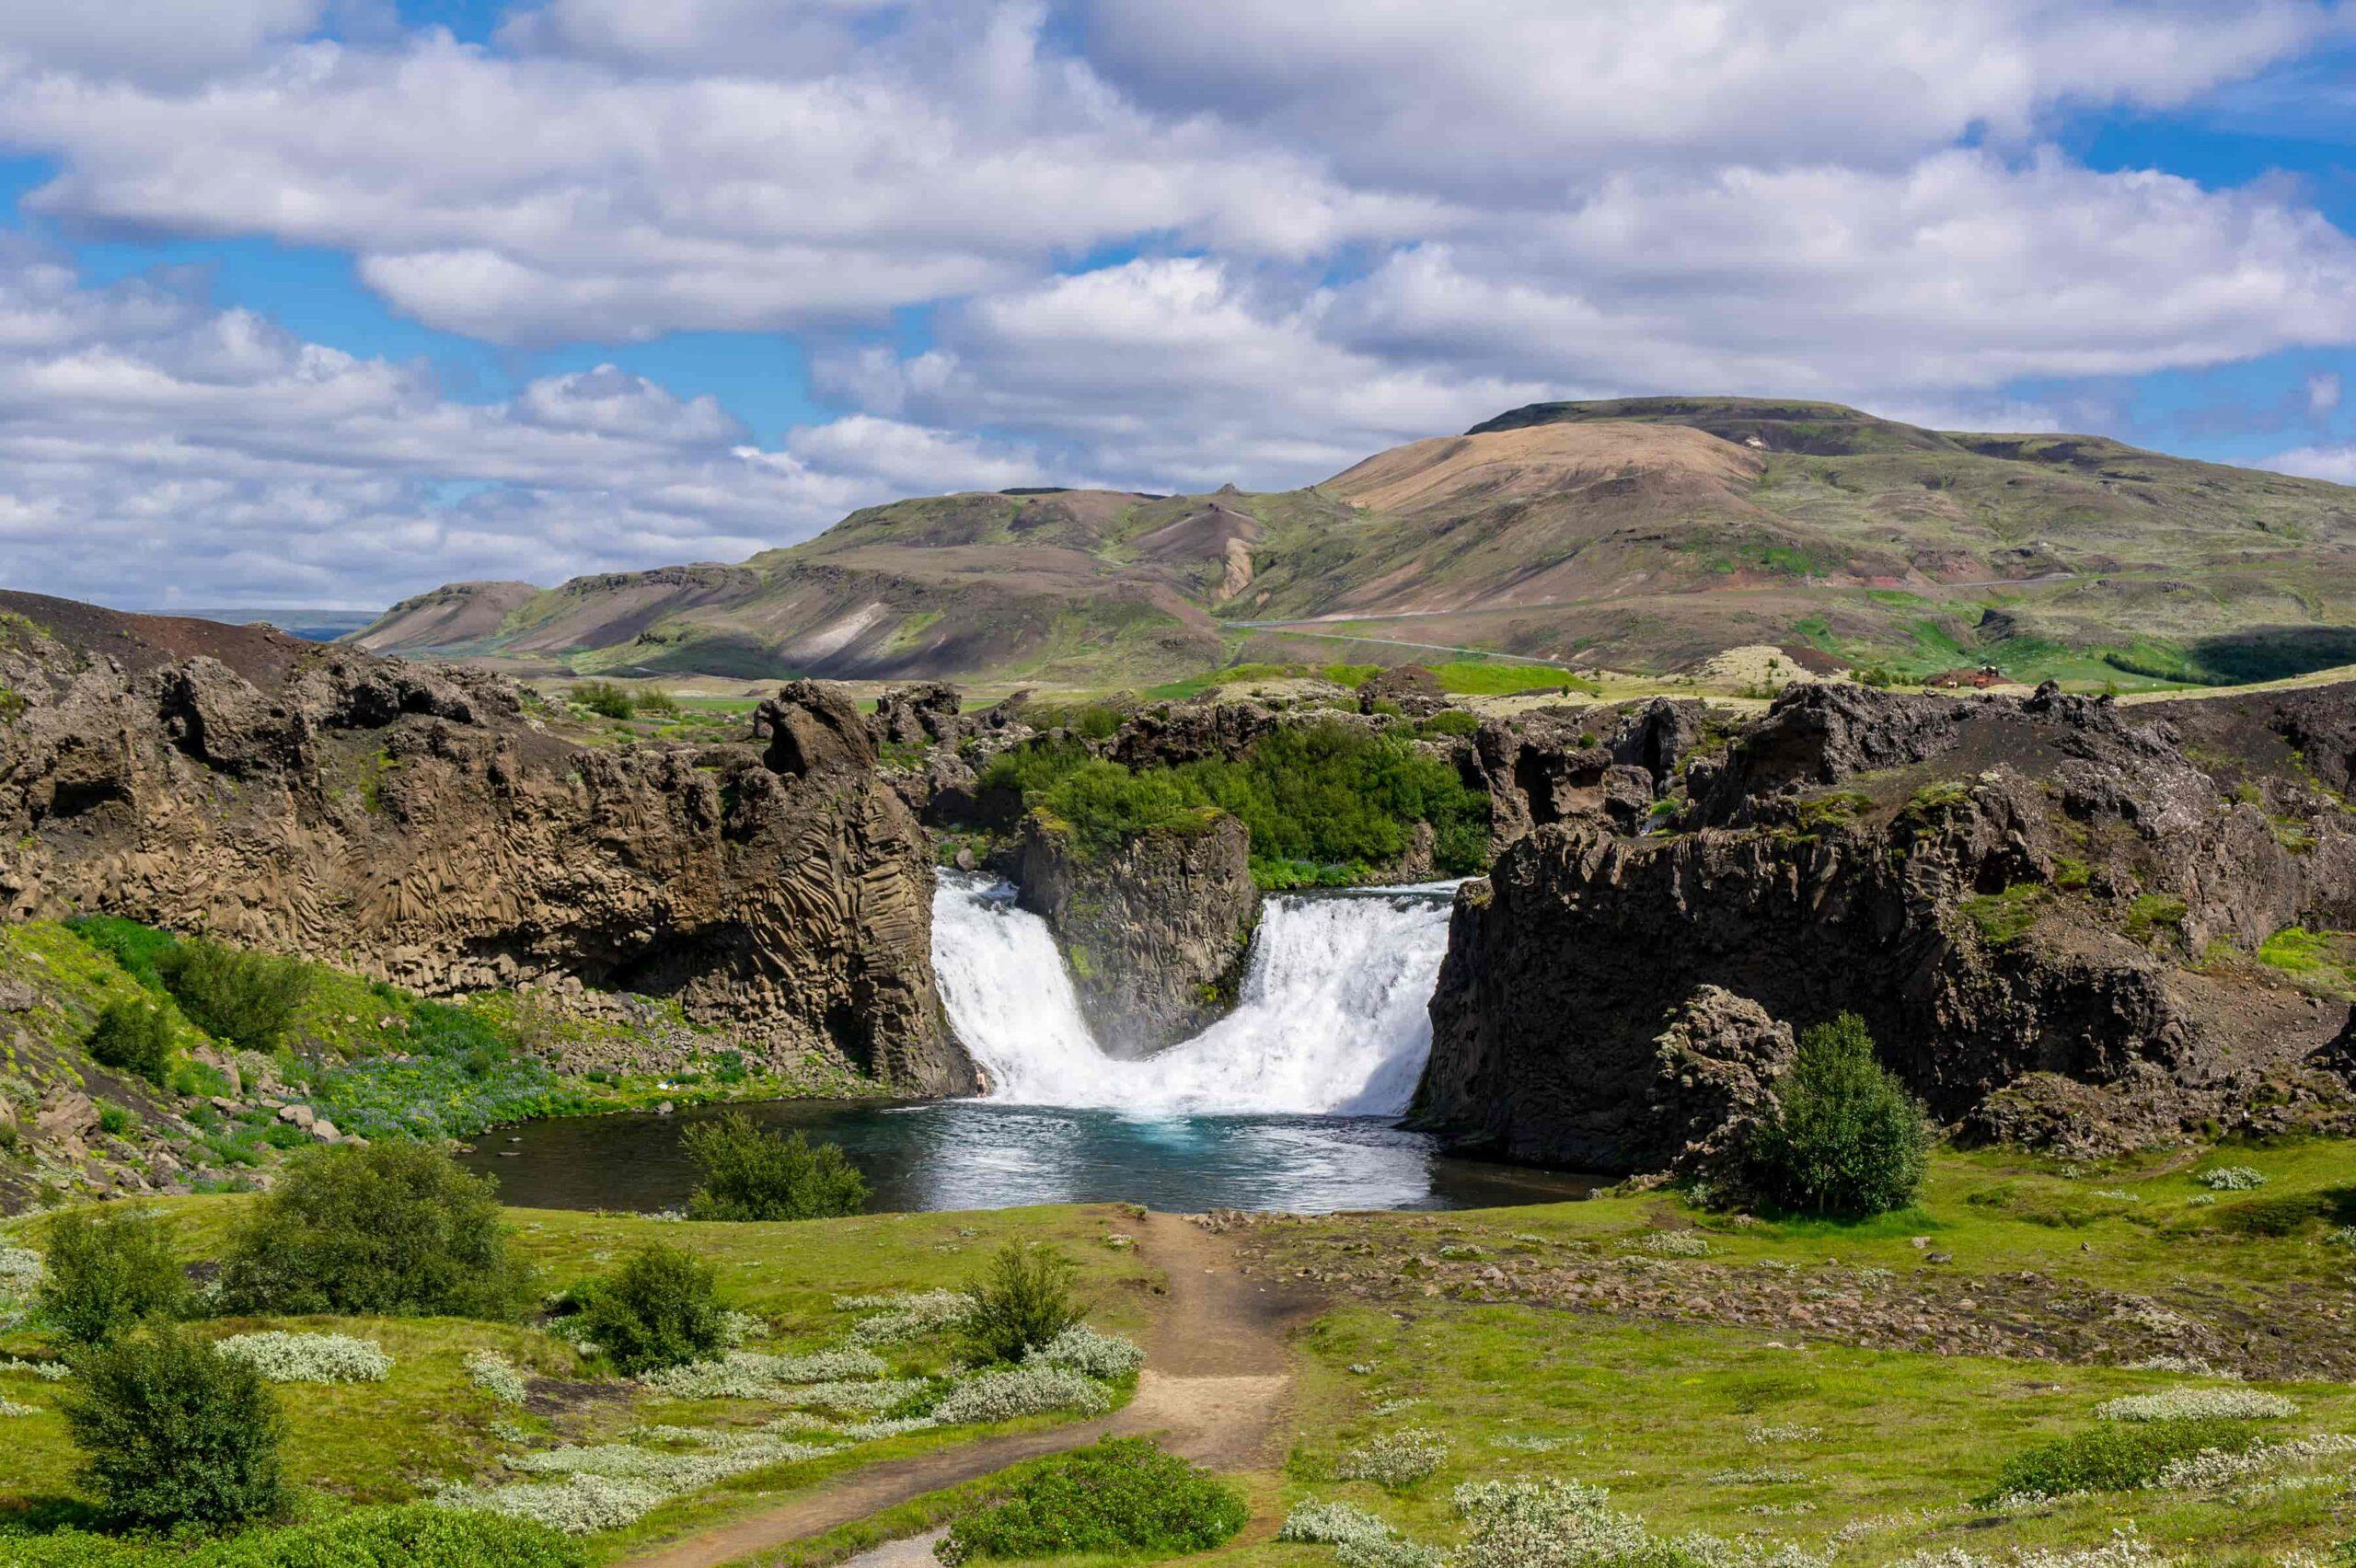 Hjálparfoss waterfall in the Golden Circle Highlands of Iceland